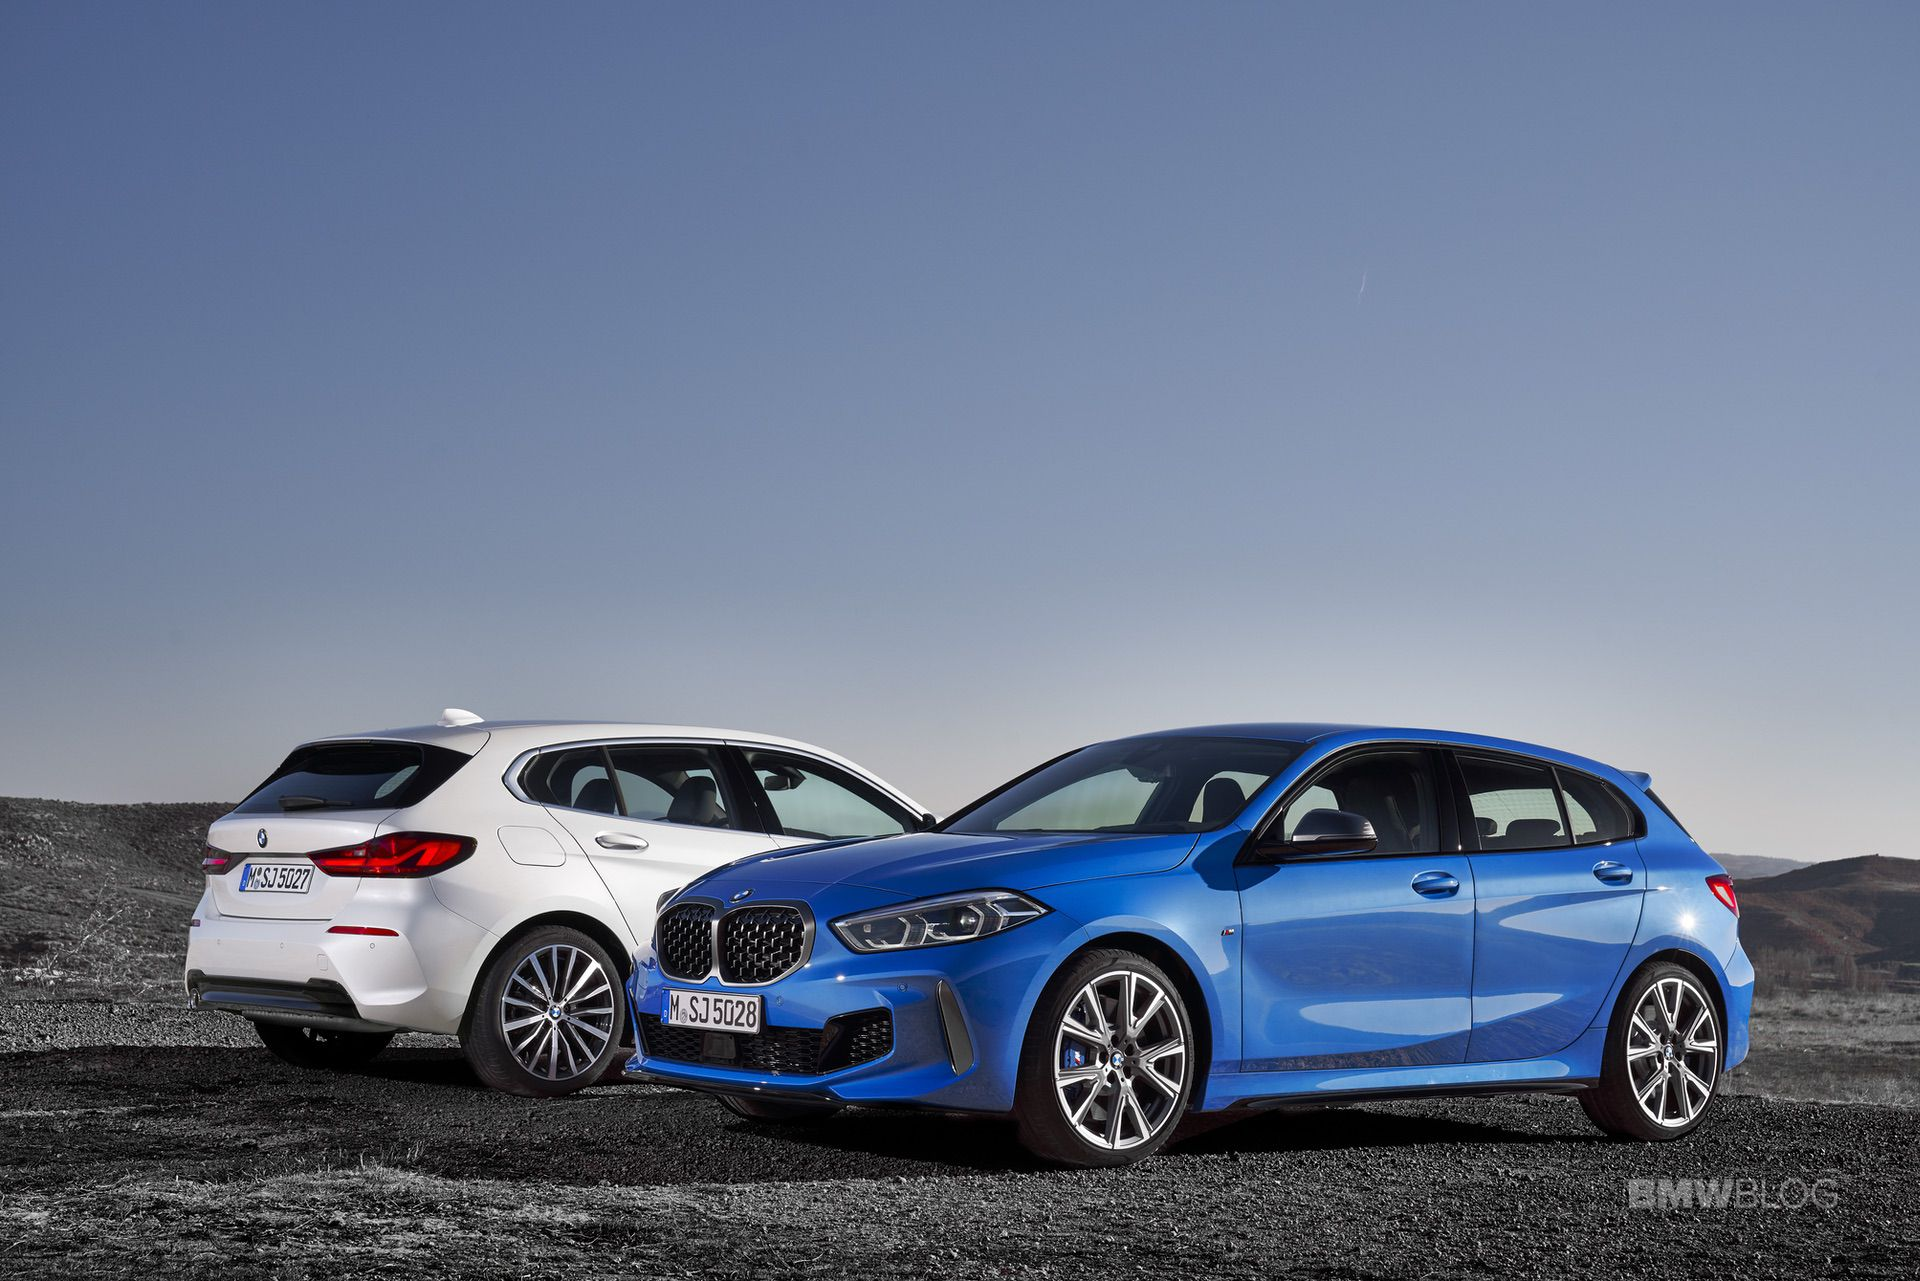 new-2019-BMW-1-Series-photos-05.jpg